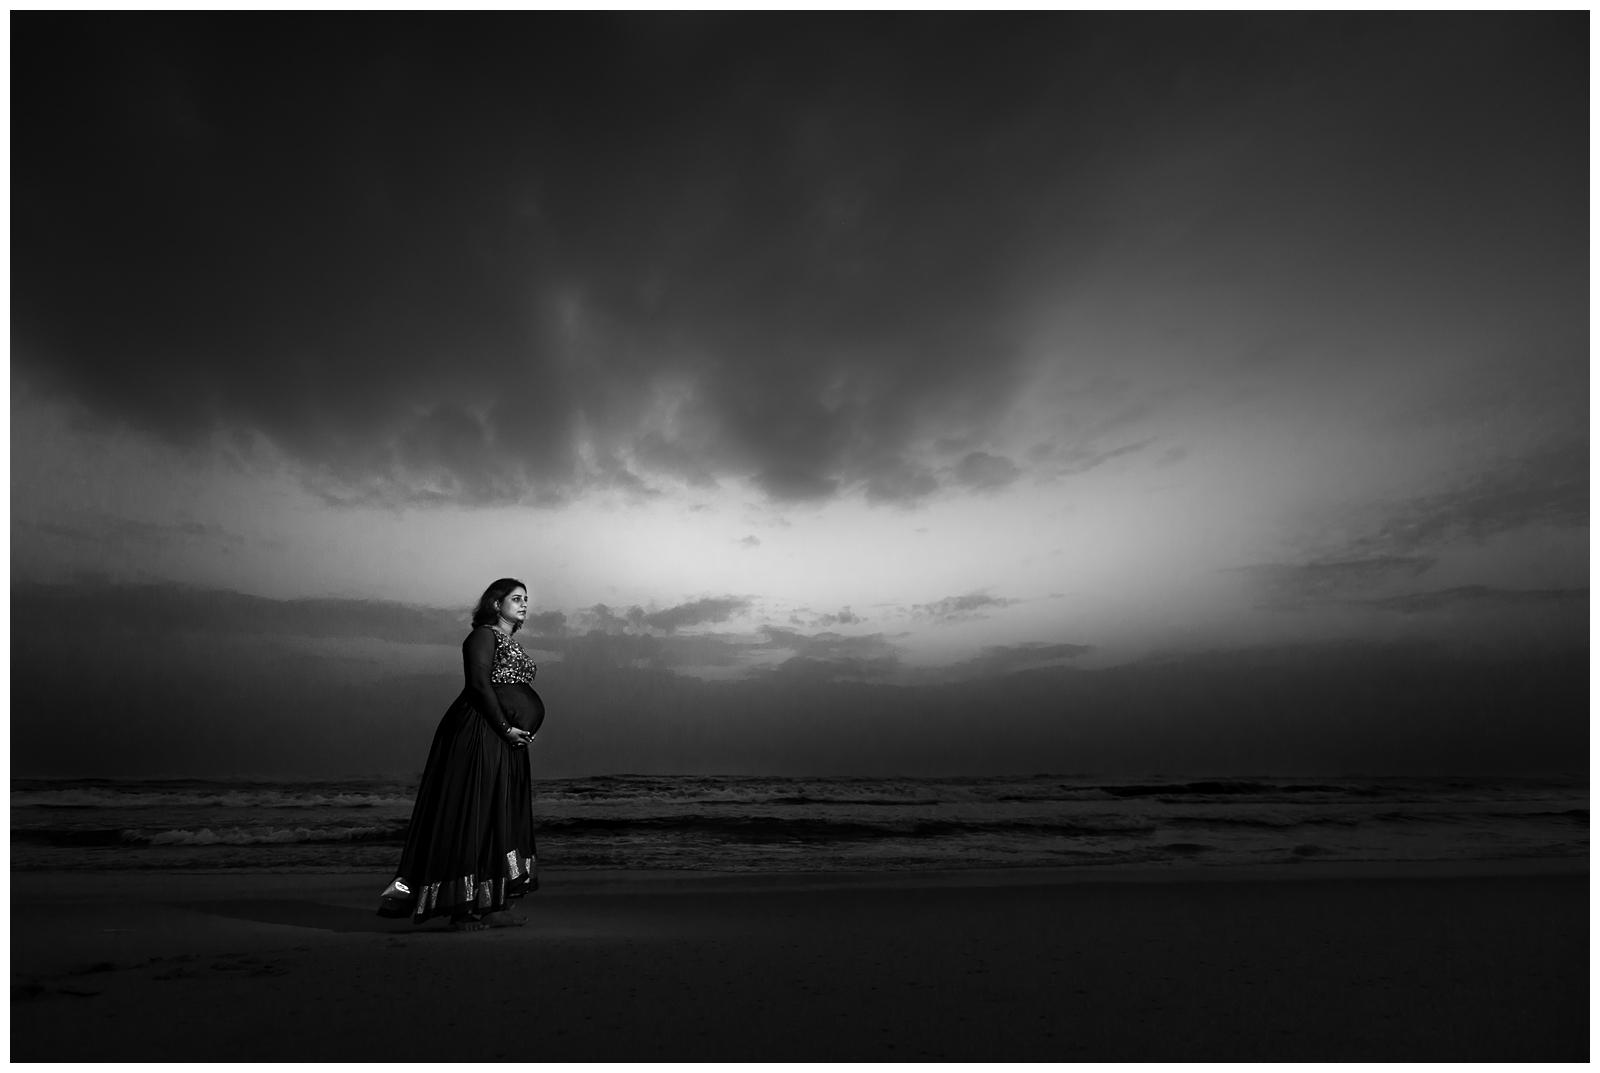 09122017-Smrithi-Second-Maternity-Shoot-027-2.JPG